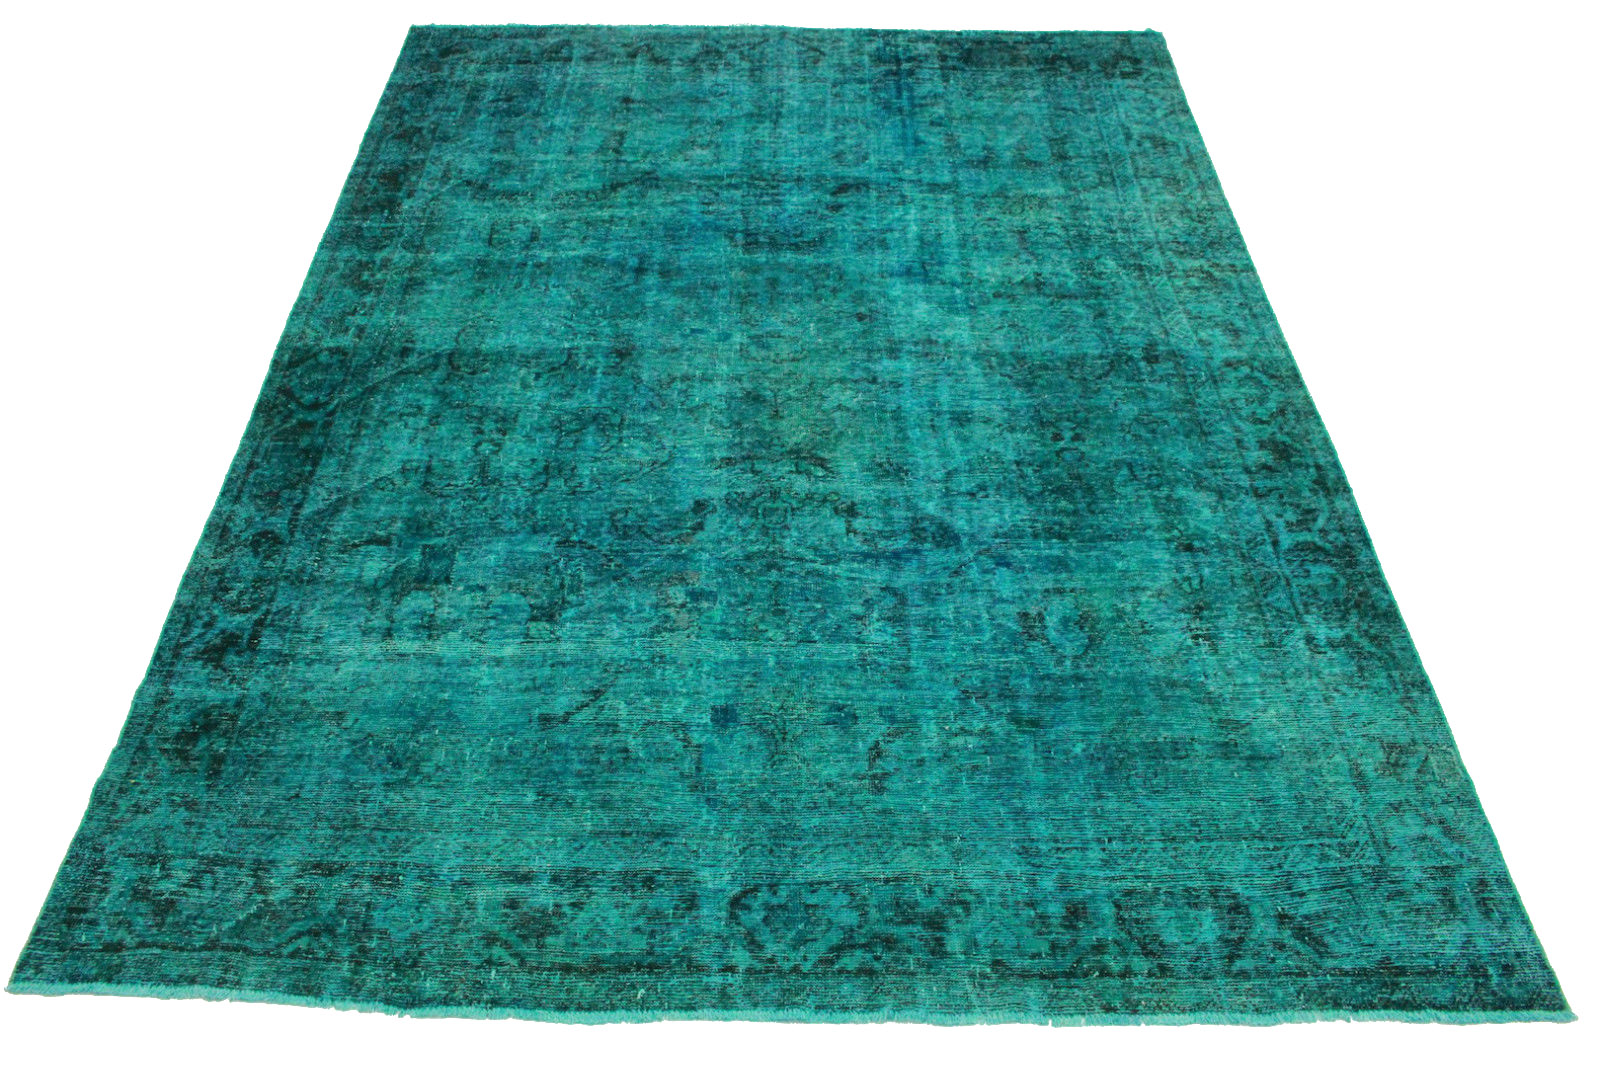 vintage teppich t rkis in 380x280cm 1001 3345 bei kaufen. Black Bedroom Furniture Sets. Home Design Ideas